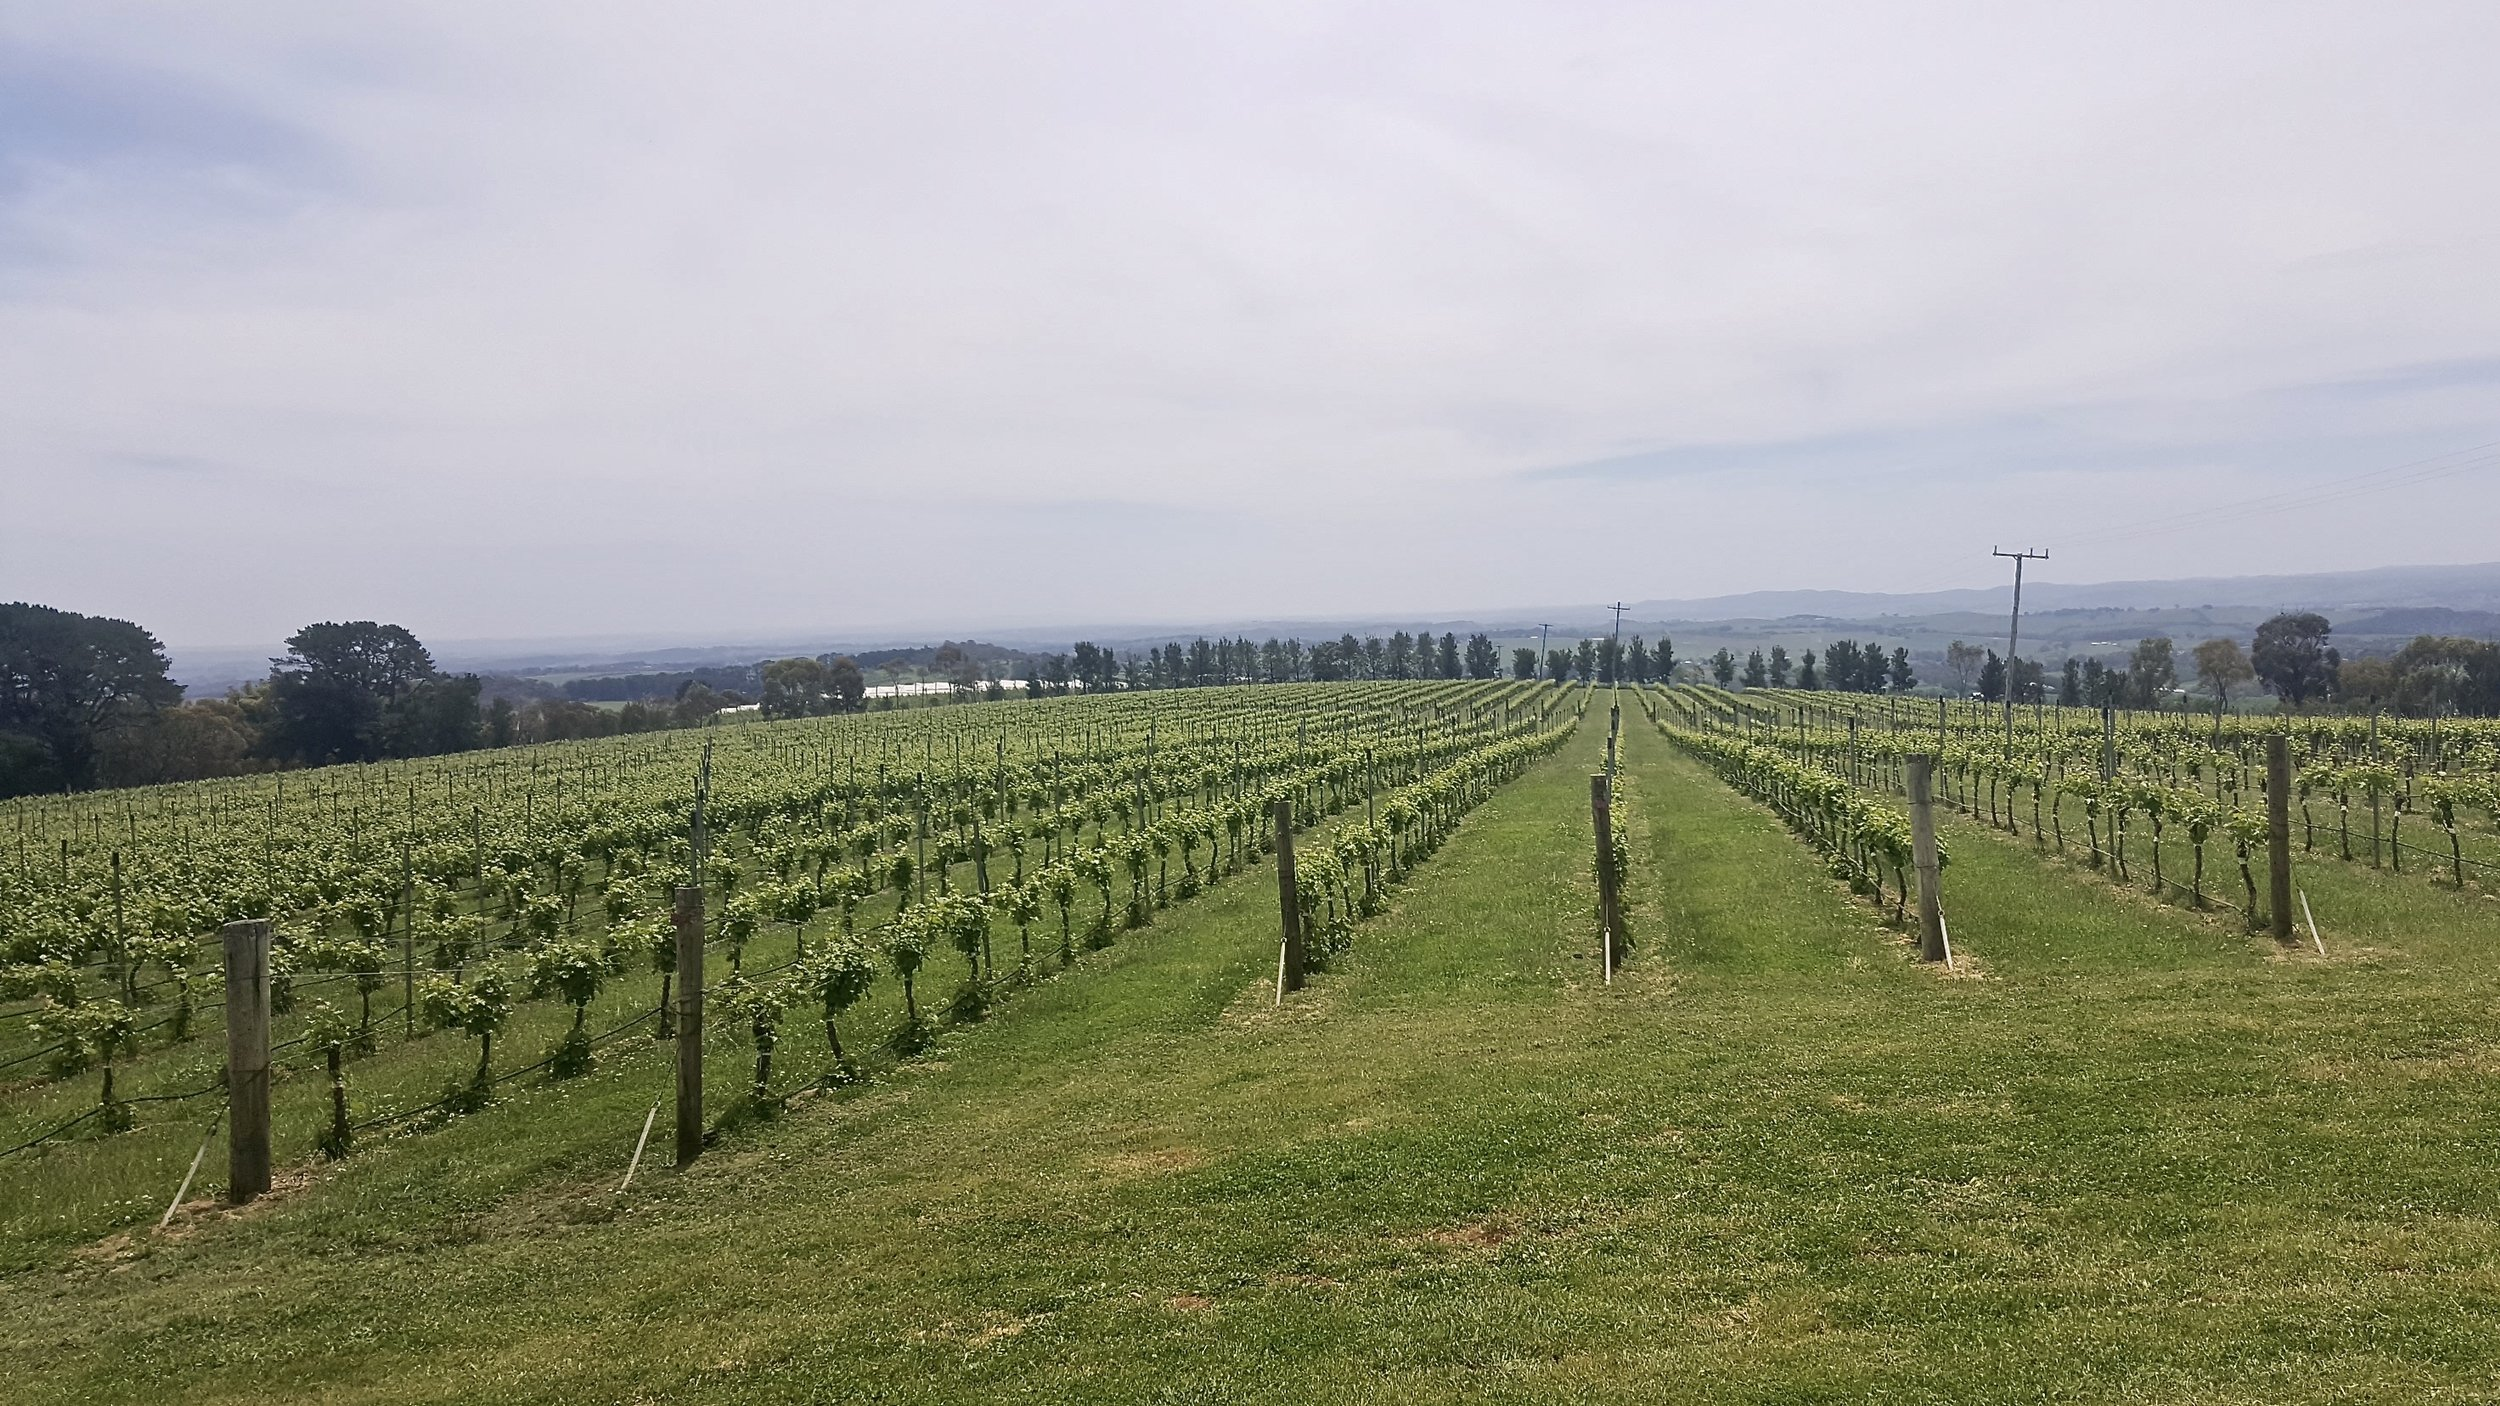 De Salis vineyard, Orange, Central New South Wales, Australia